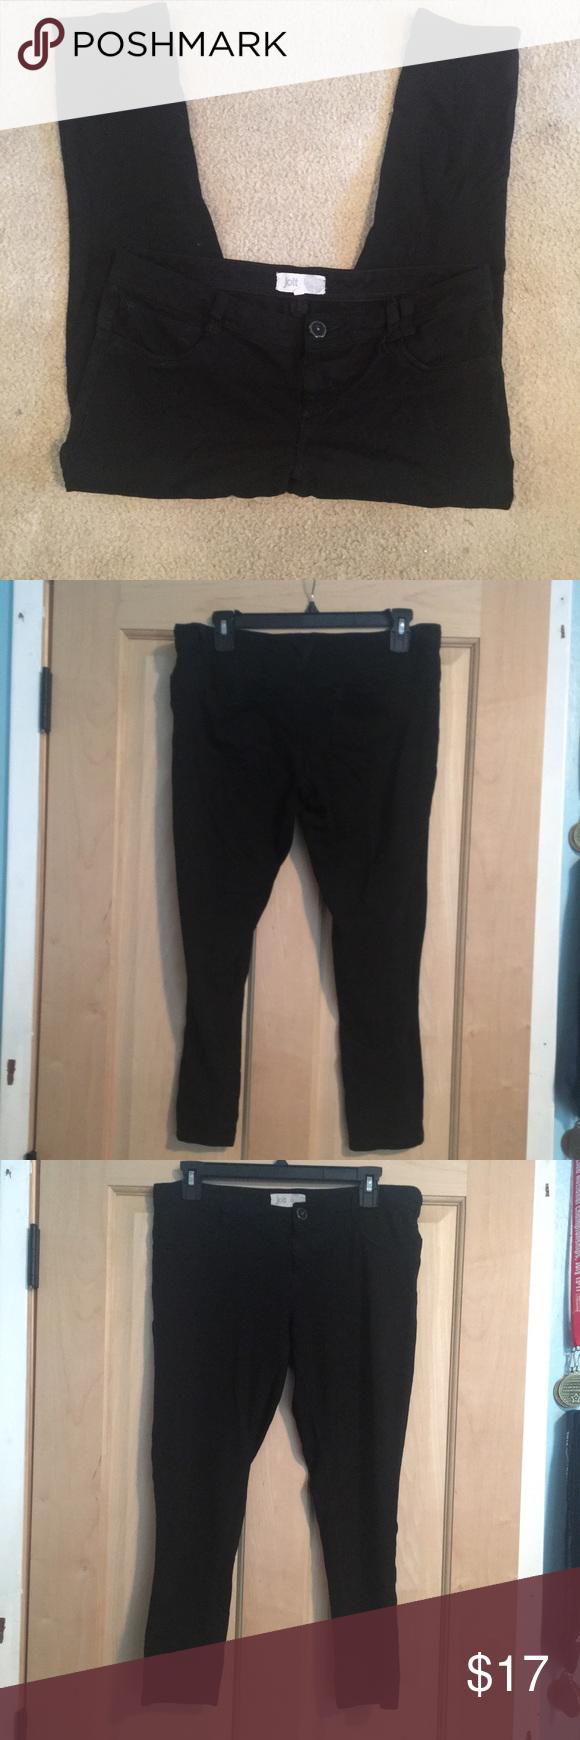 e63fa6c54dc2b Jolt jeggins super comfy cropped black jolt jeggings no zipper - has a  button fits wider in the hips Pants Ankle & Cropped